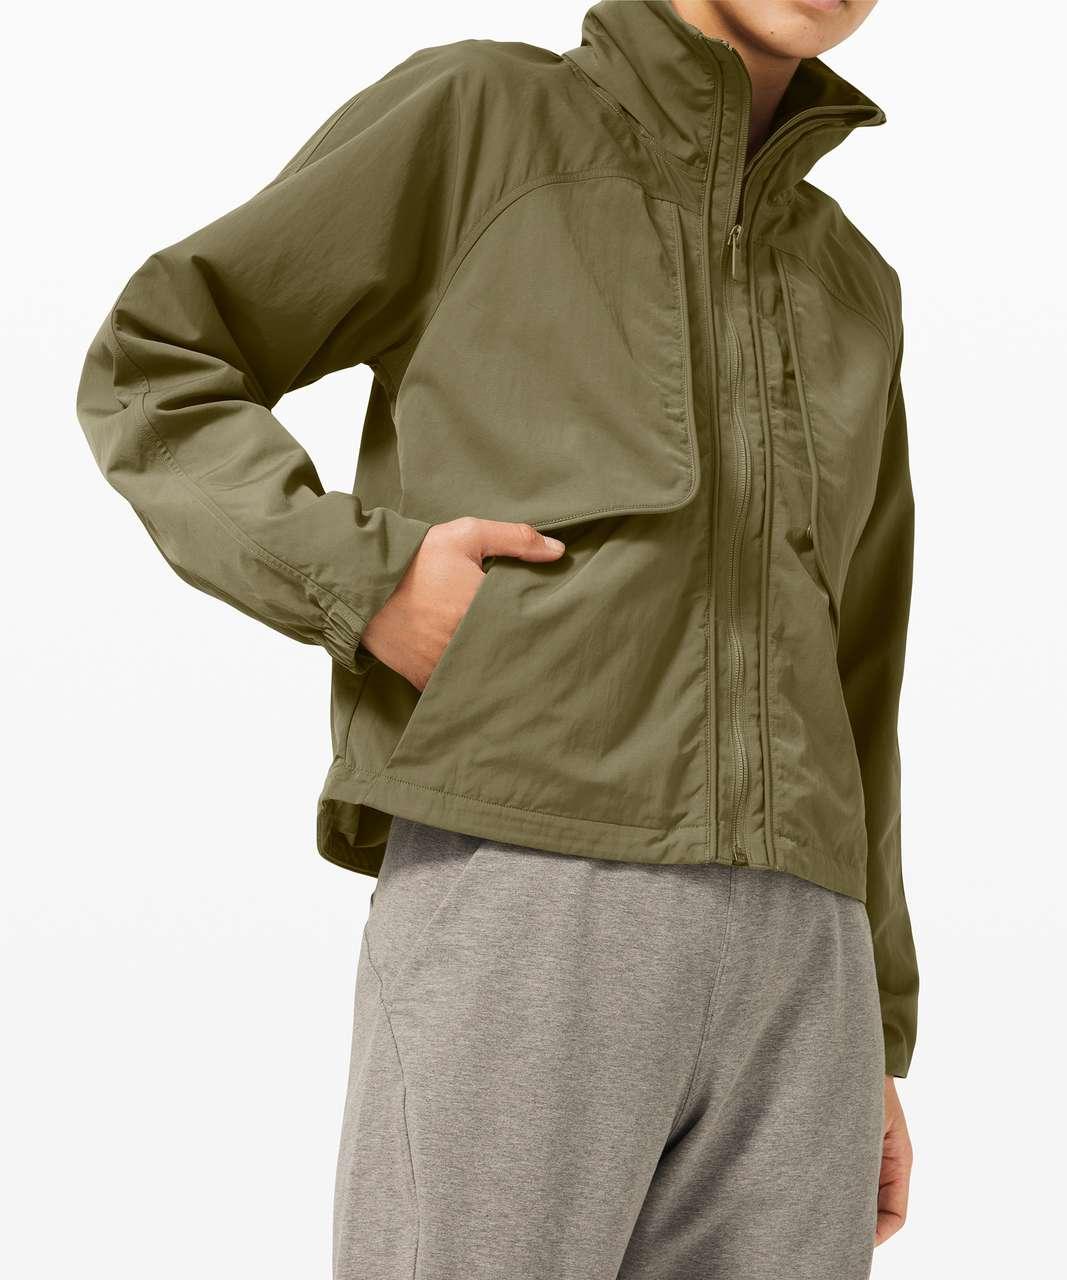 Lululemon Always Effortless Jacket - Medium Olive